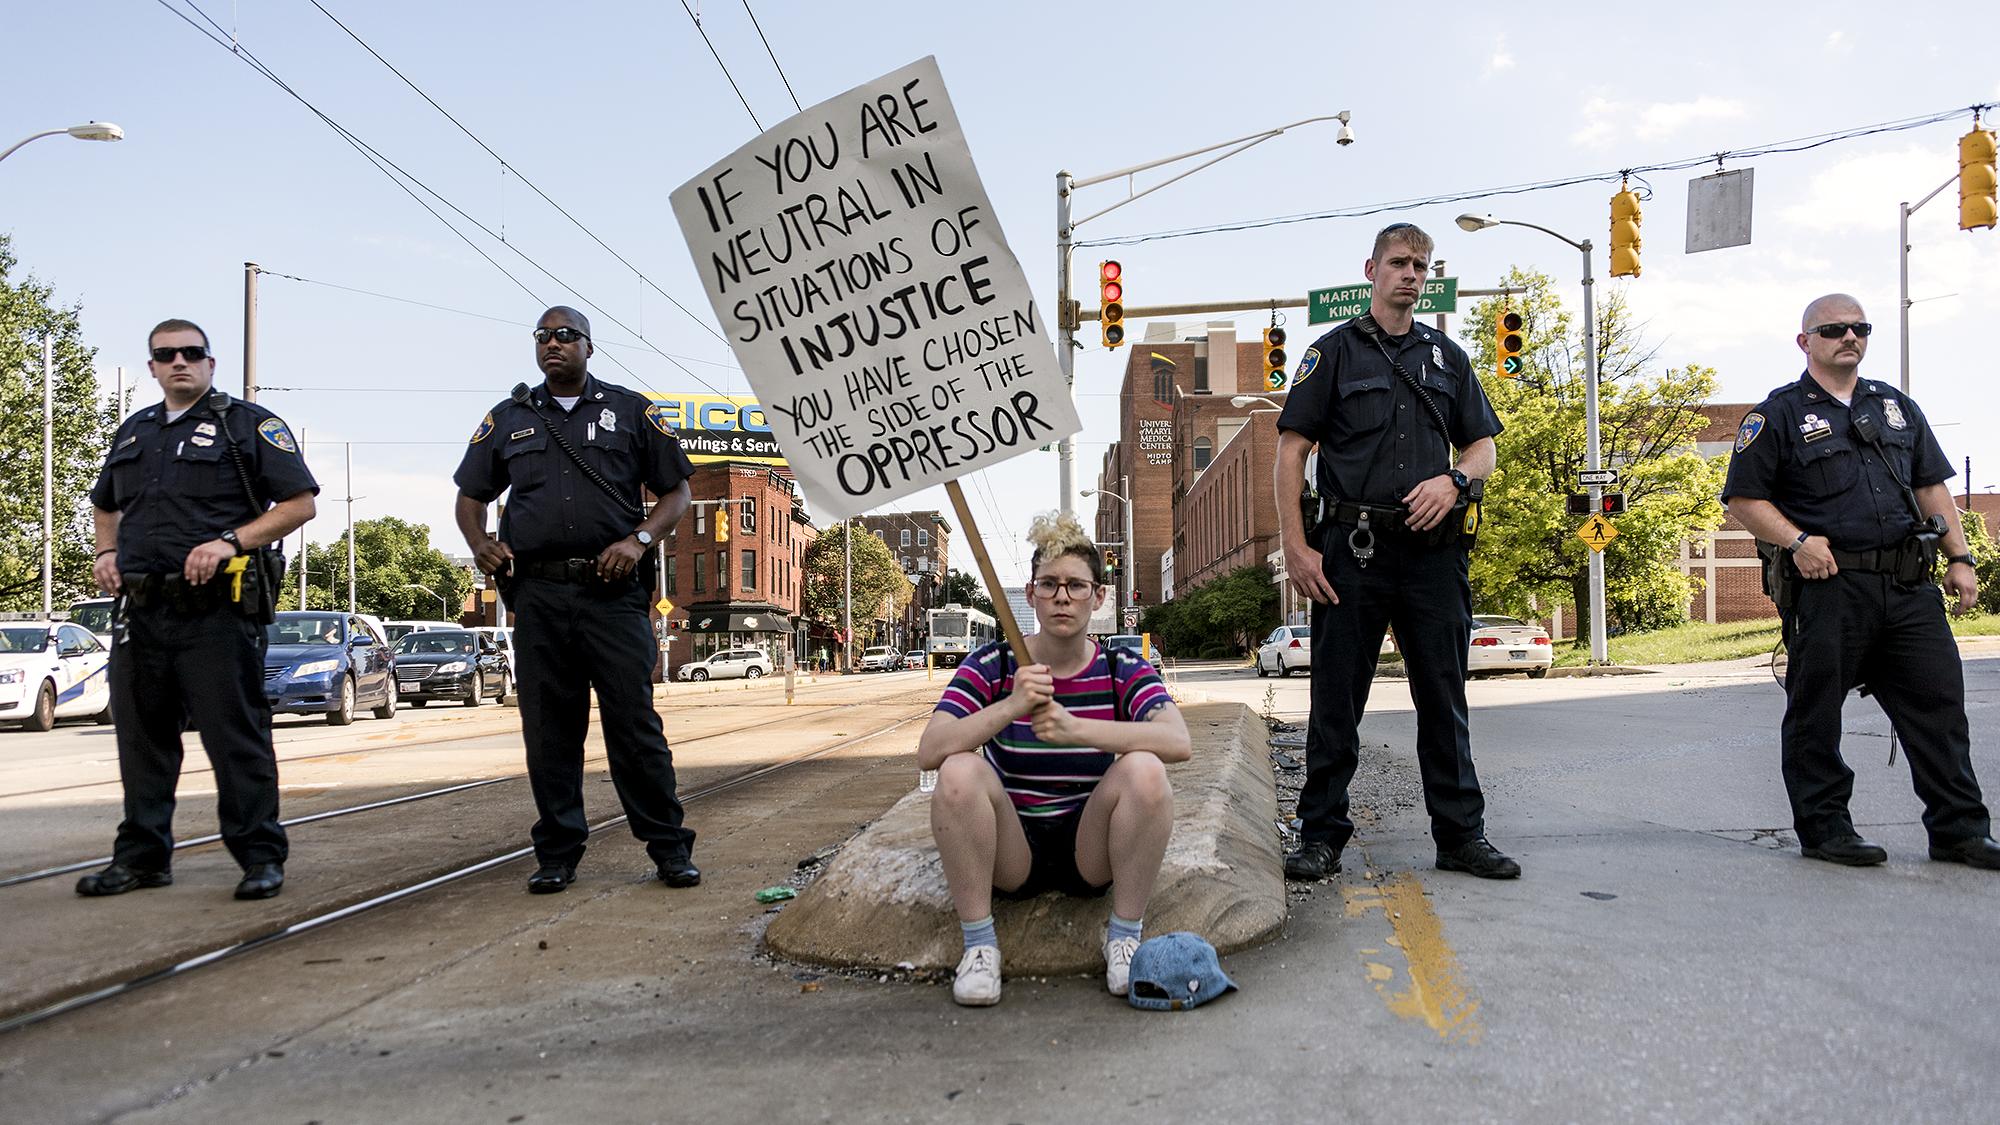 NCJ_PROTEST16b.jpg